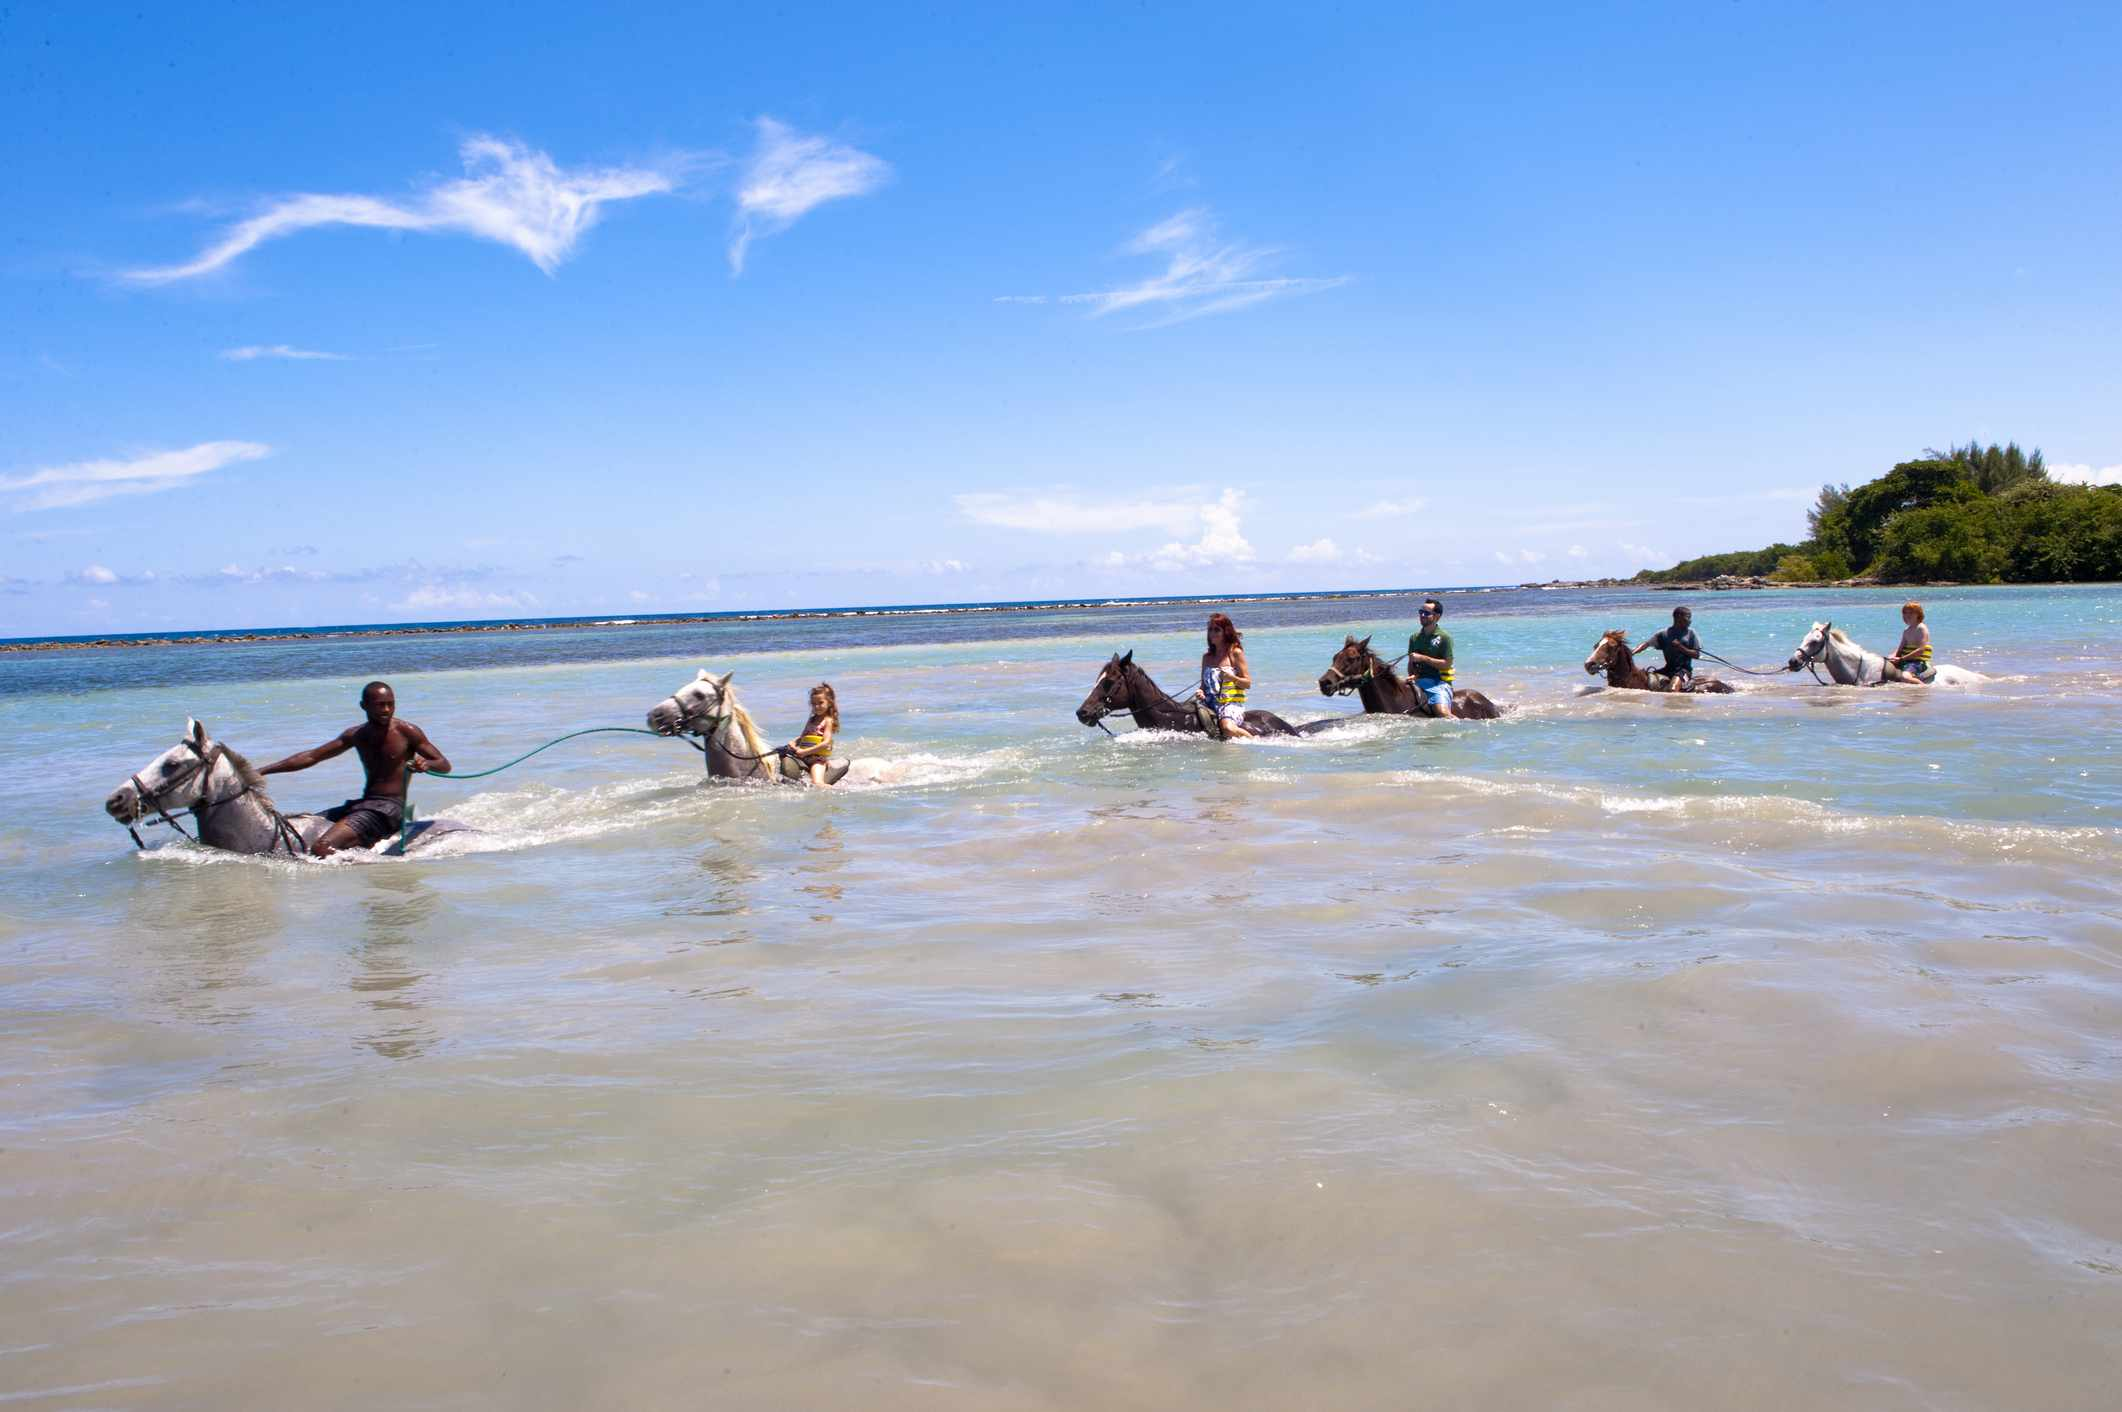 Chukka Caribbean Adventures in Jamaica